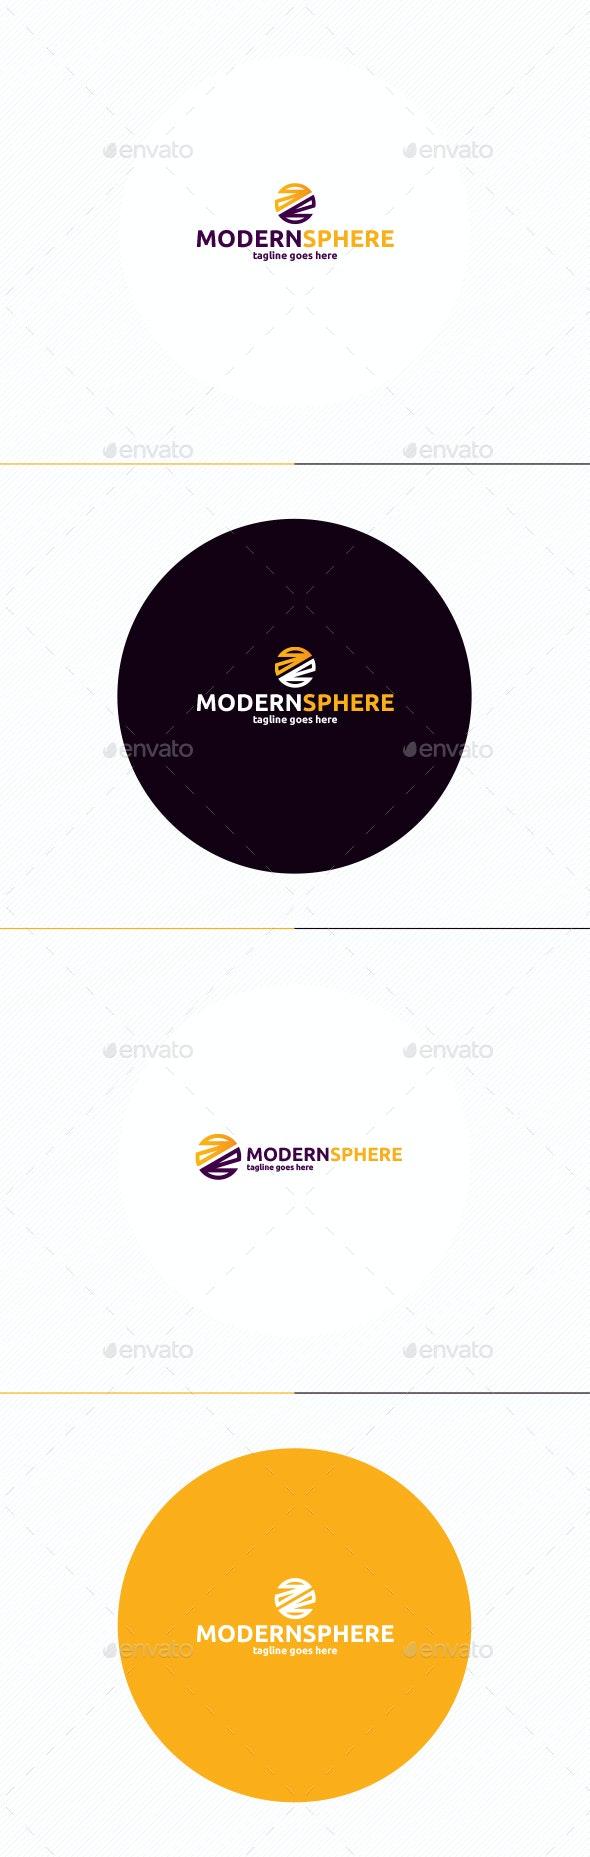 Modern Sphere Logo - Vector Abstract